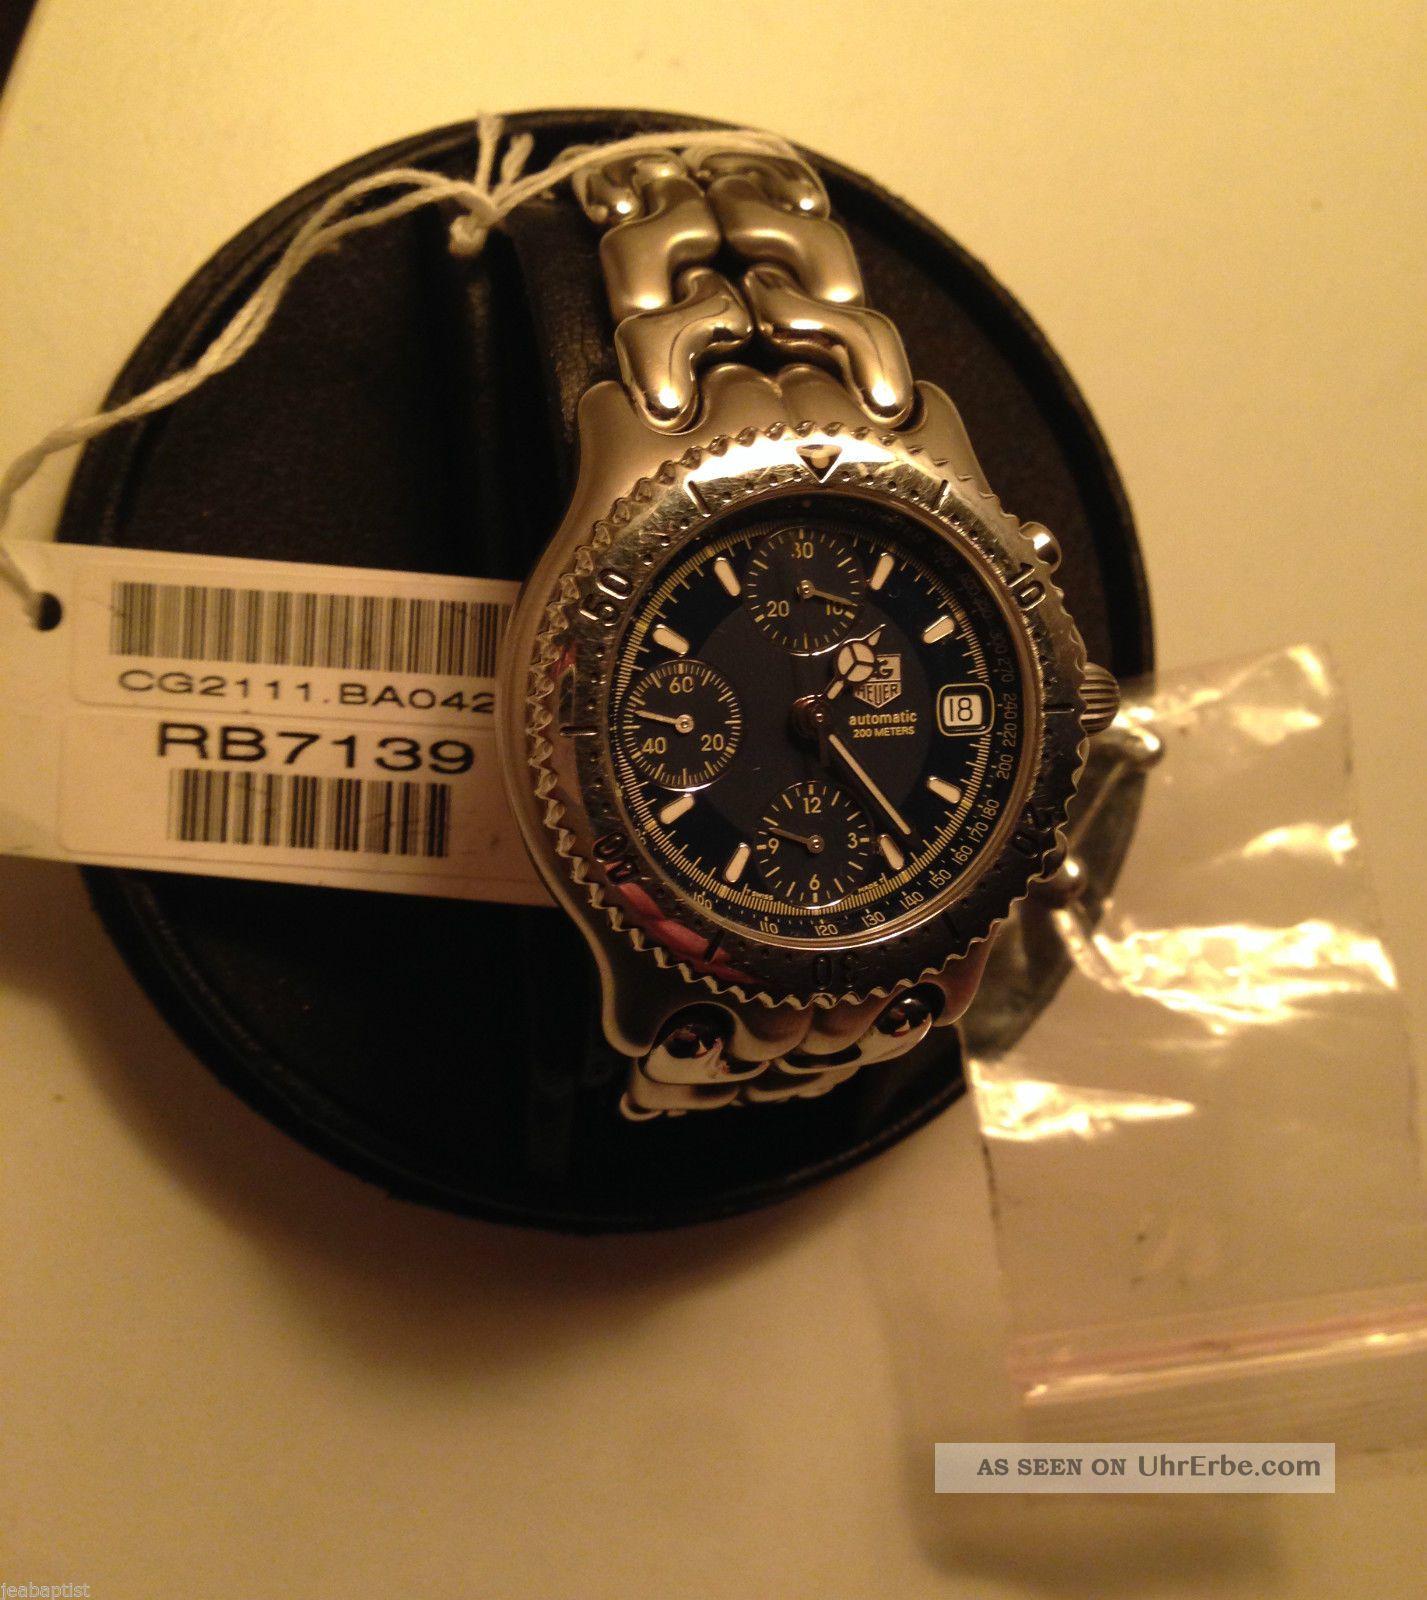 Tag Heuer Cg 2111 - Ro Professional Automatic 200m Saphirglas 25 Jewel Movement Armbanduhren Bild